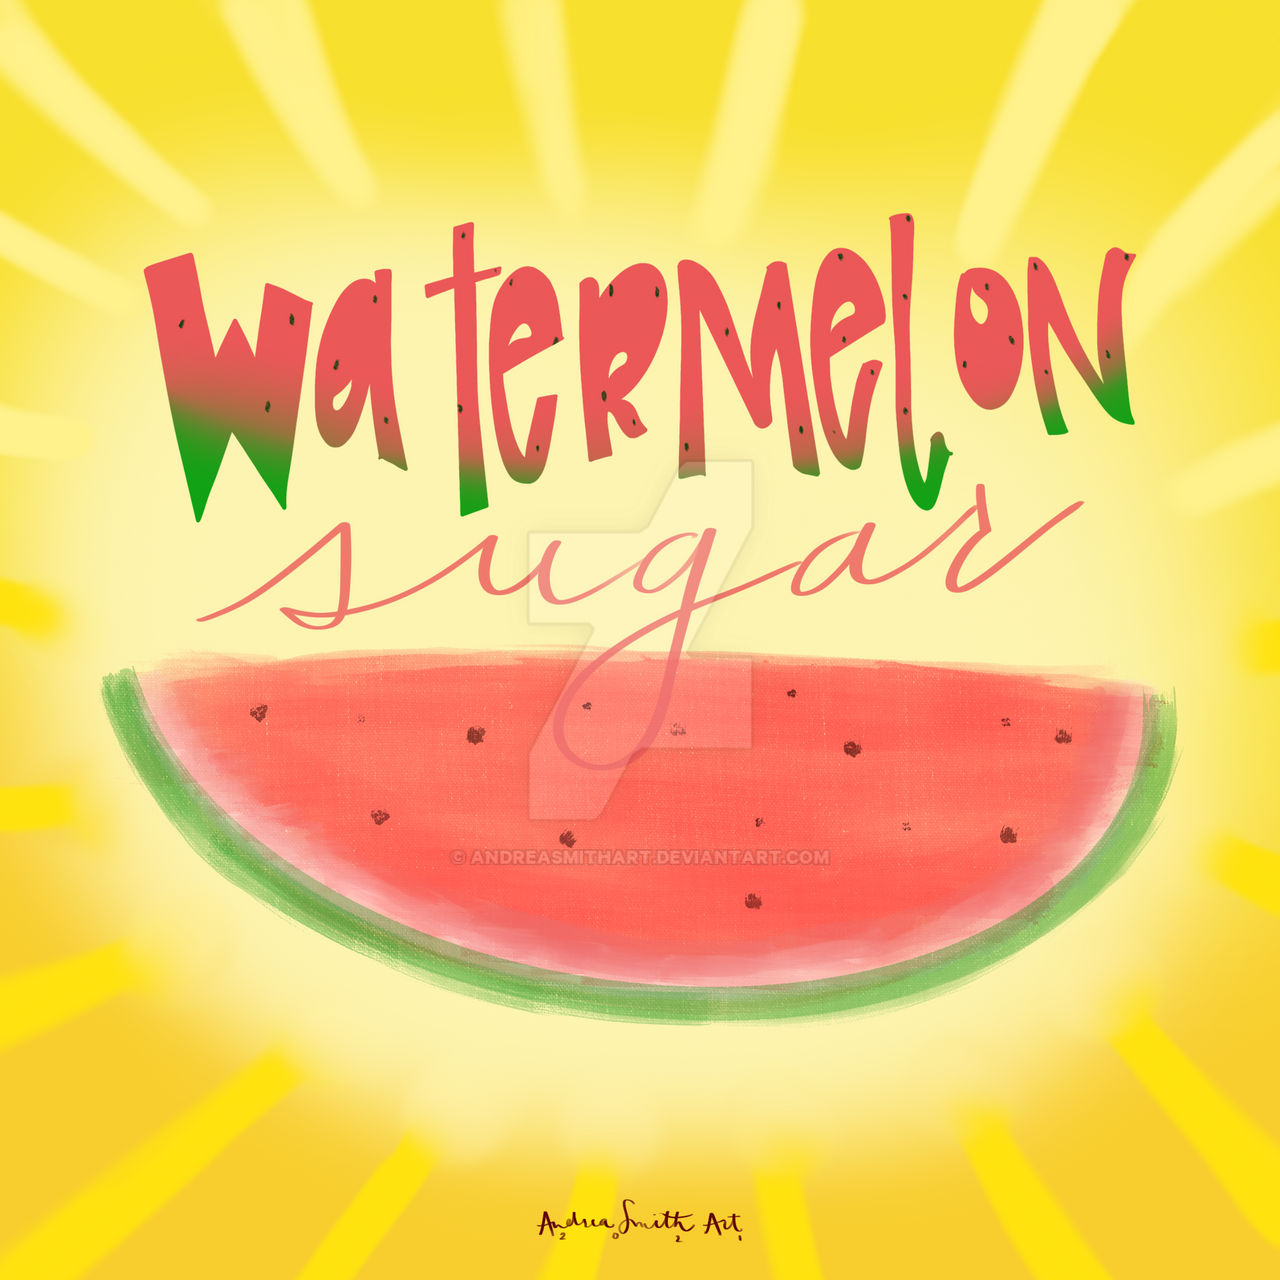 Watermelon Sugar High By Andreasmithart On Deviantart